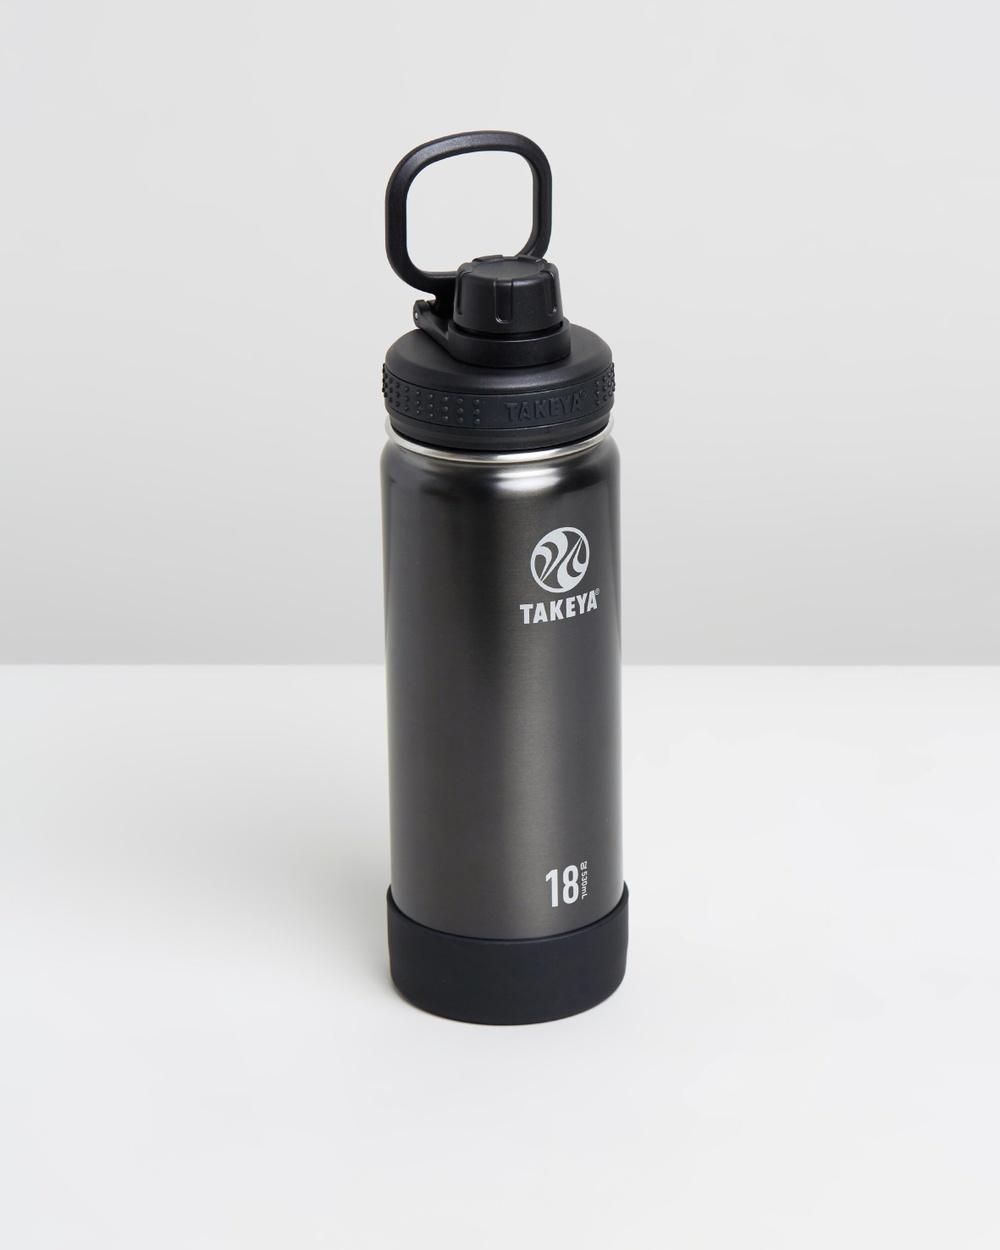 TAKEYA 530ml Insulated Stainless Steel Bottle 18oz Water Bottles Slate